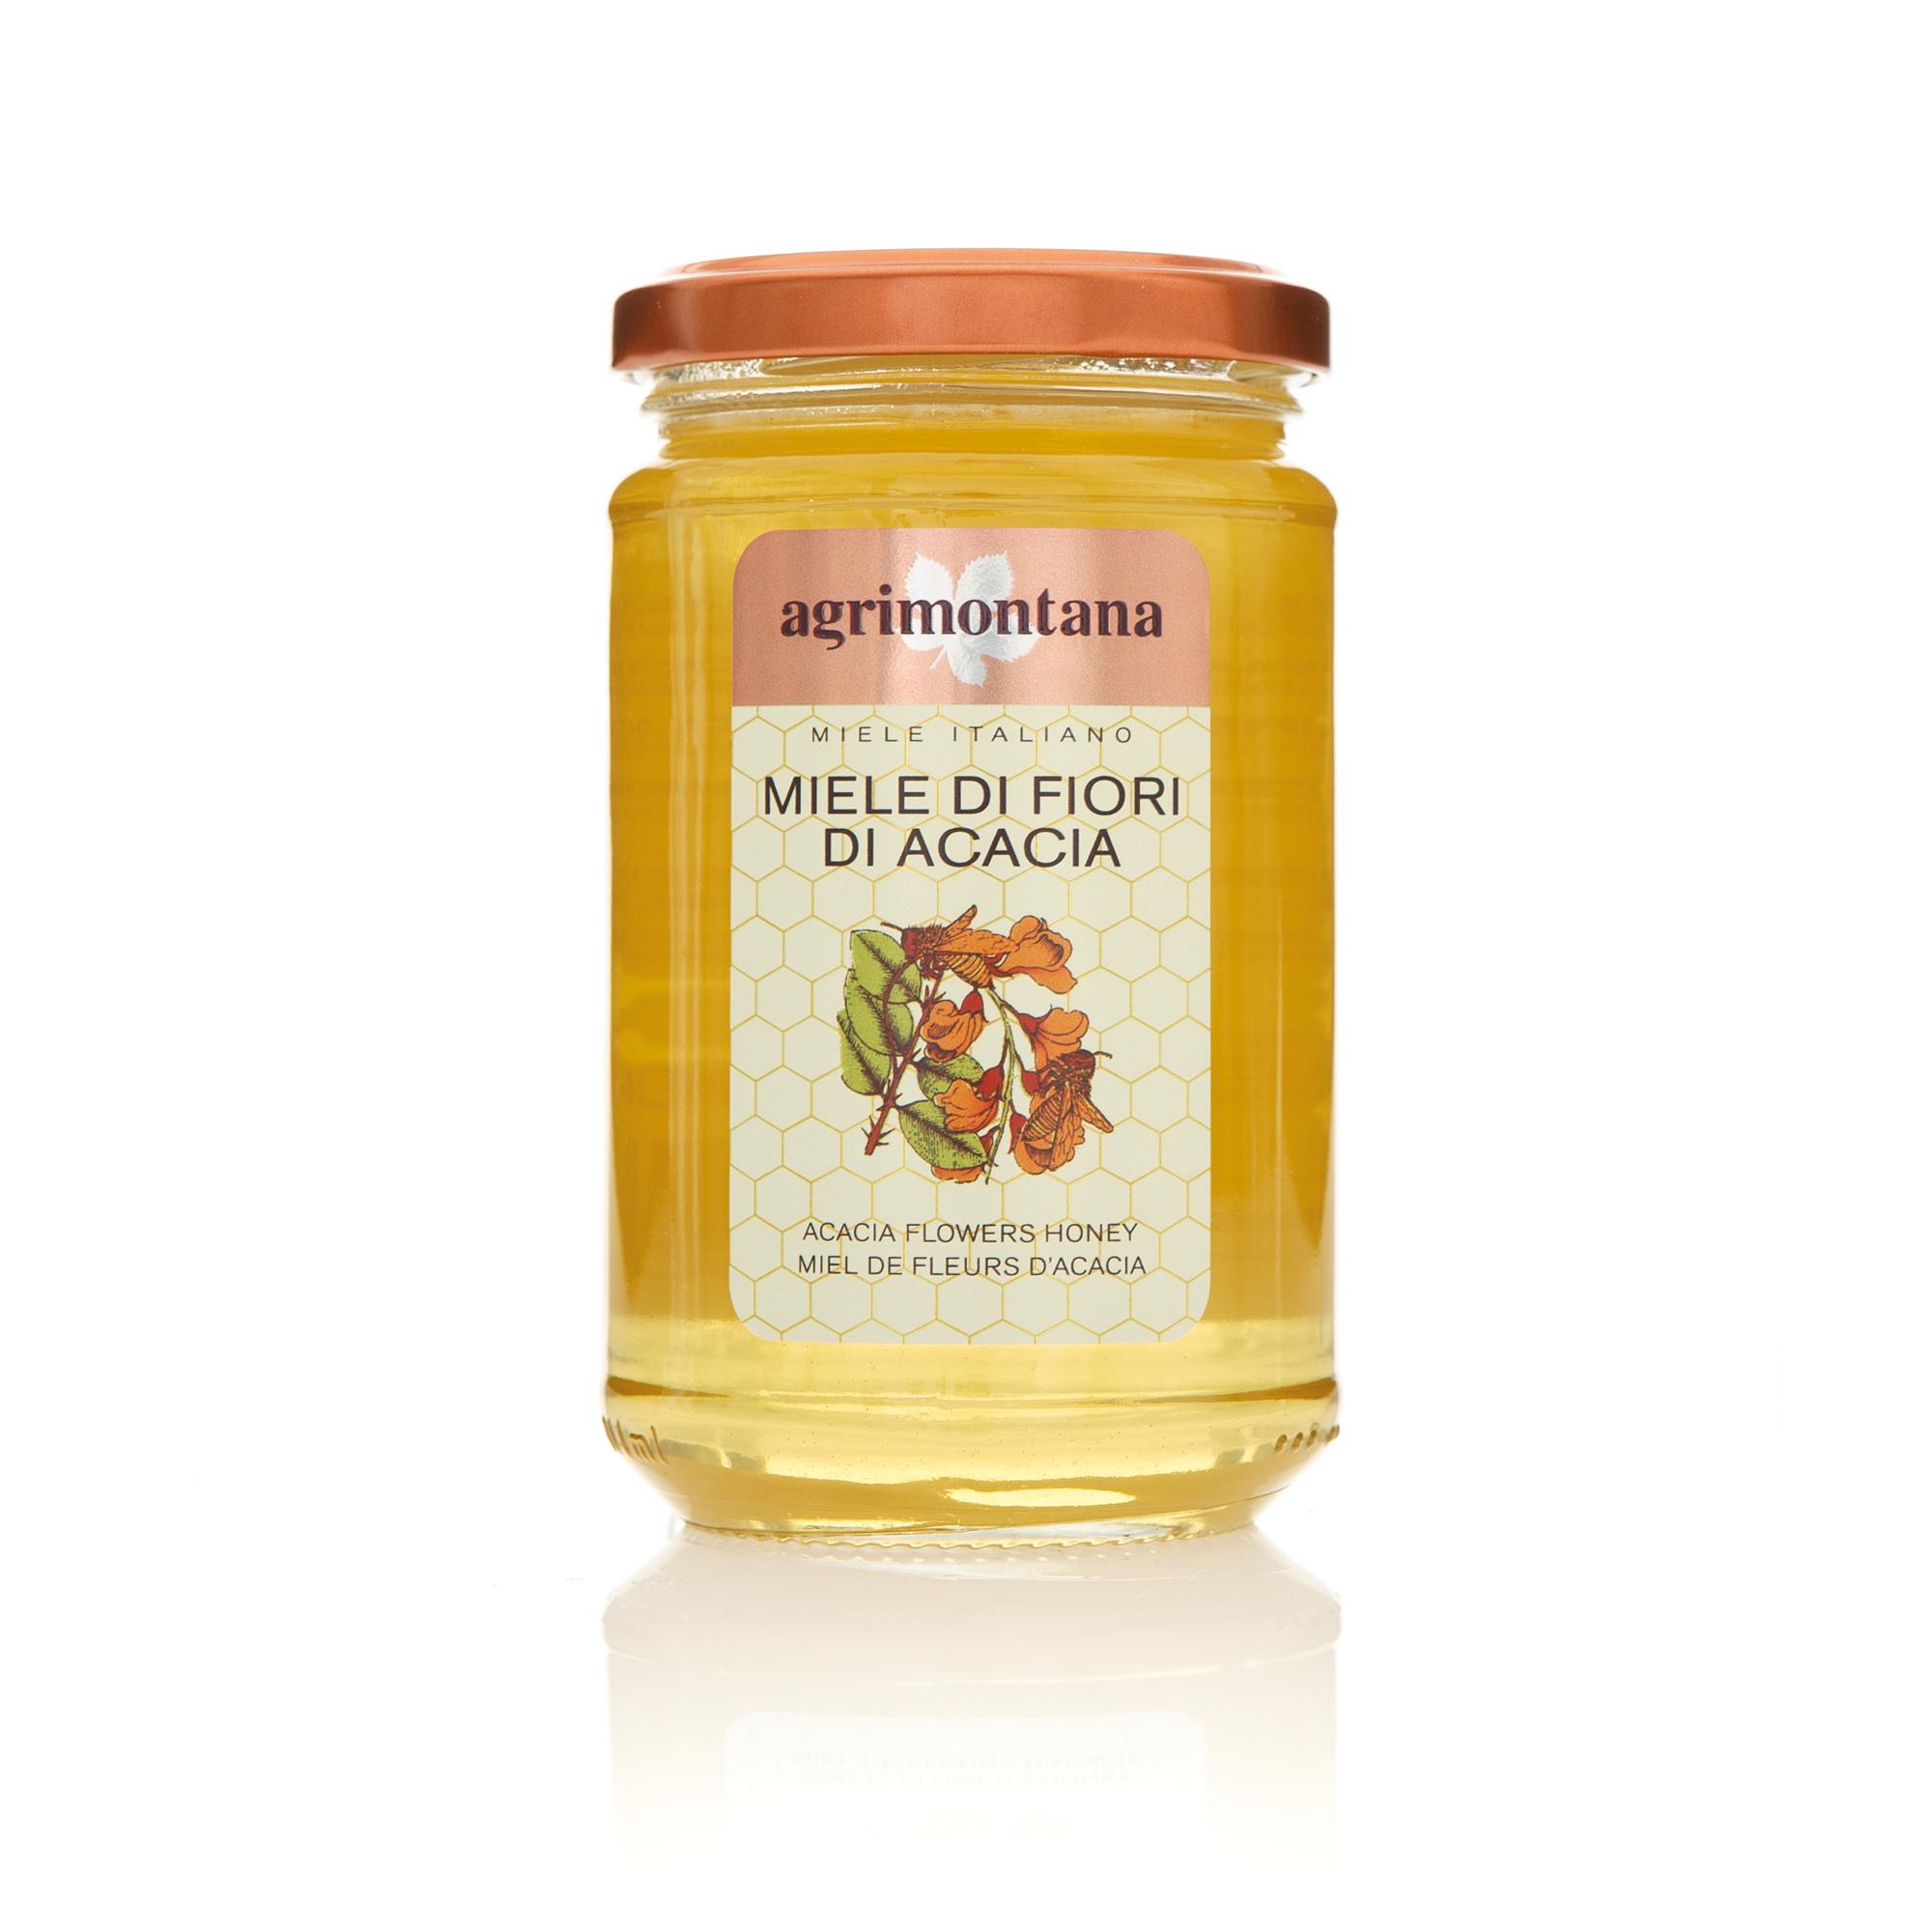 Agrimontana Acacai Honey Front View